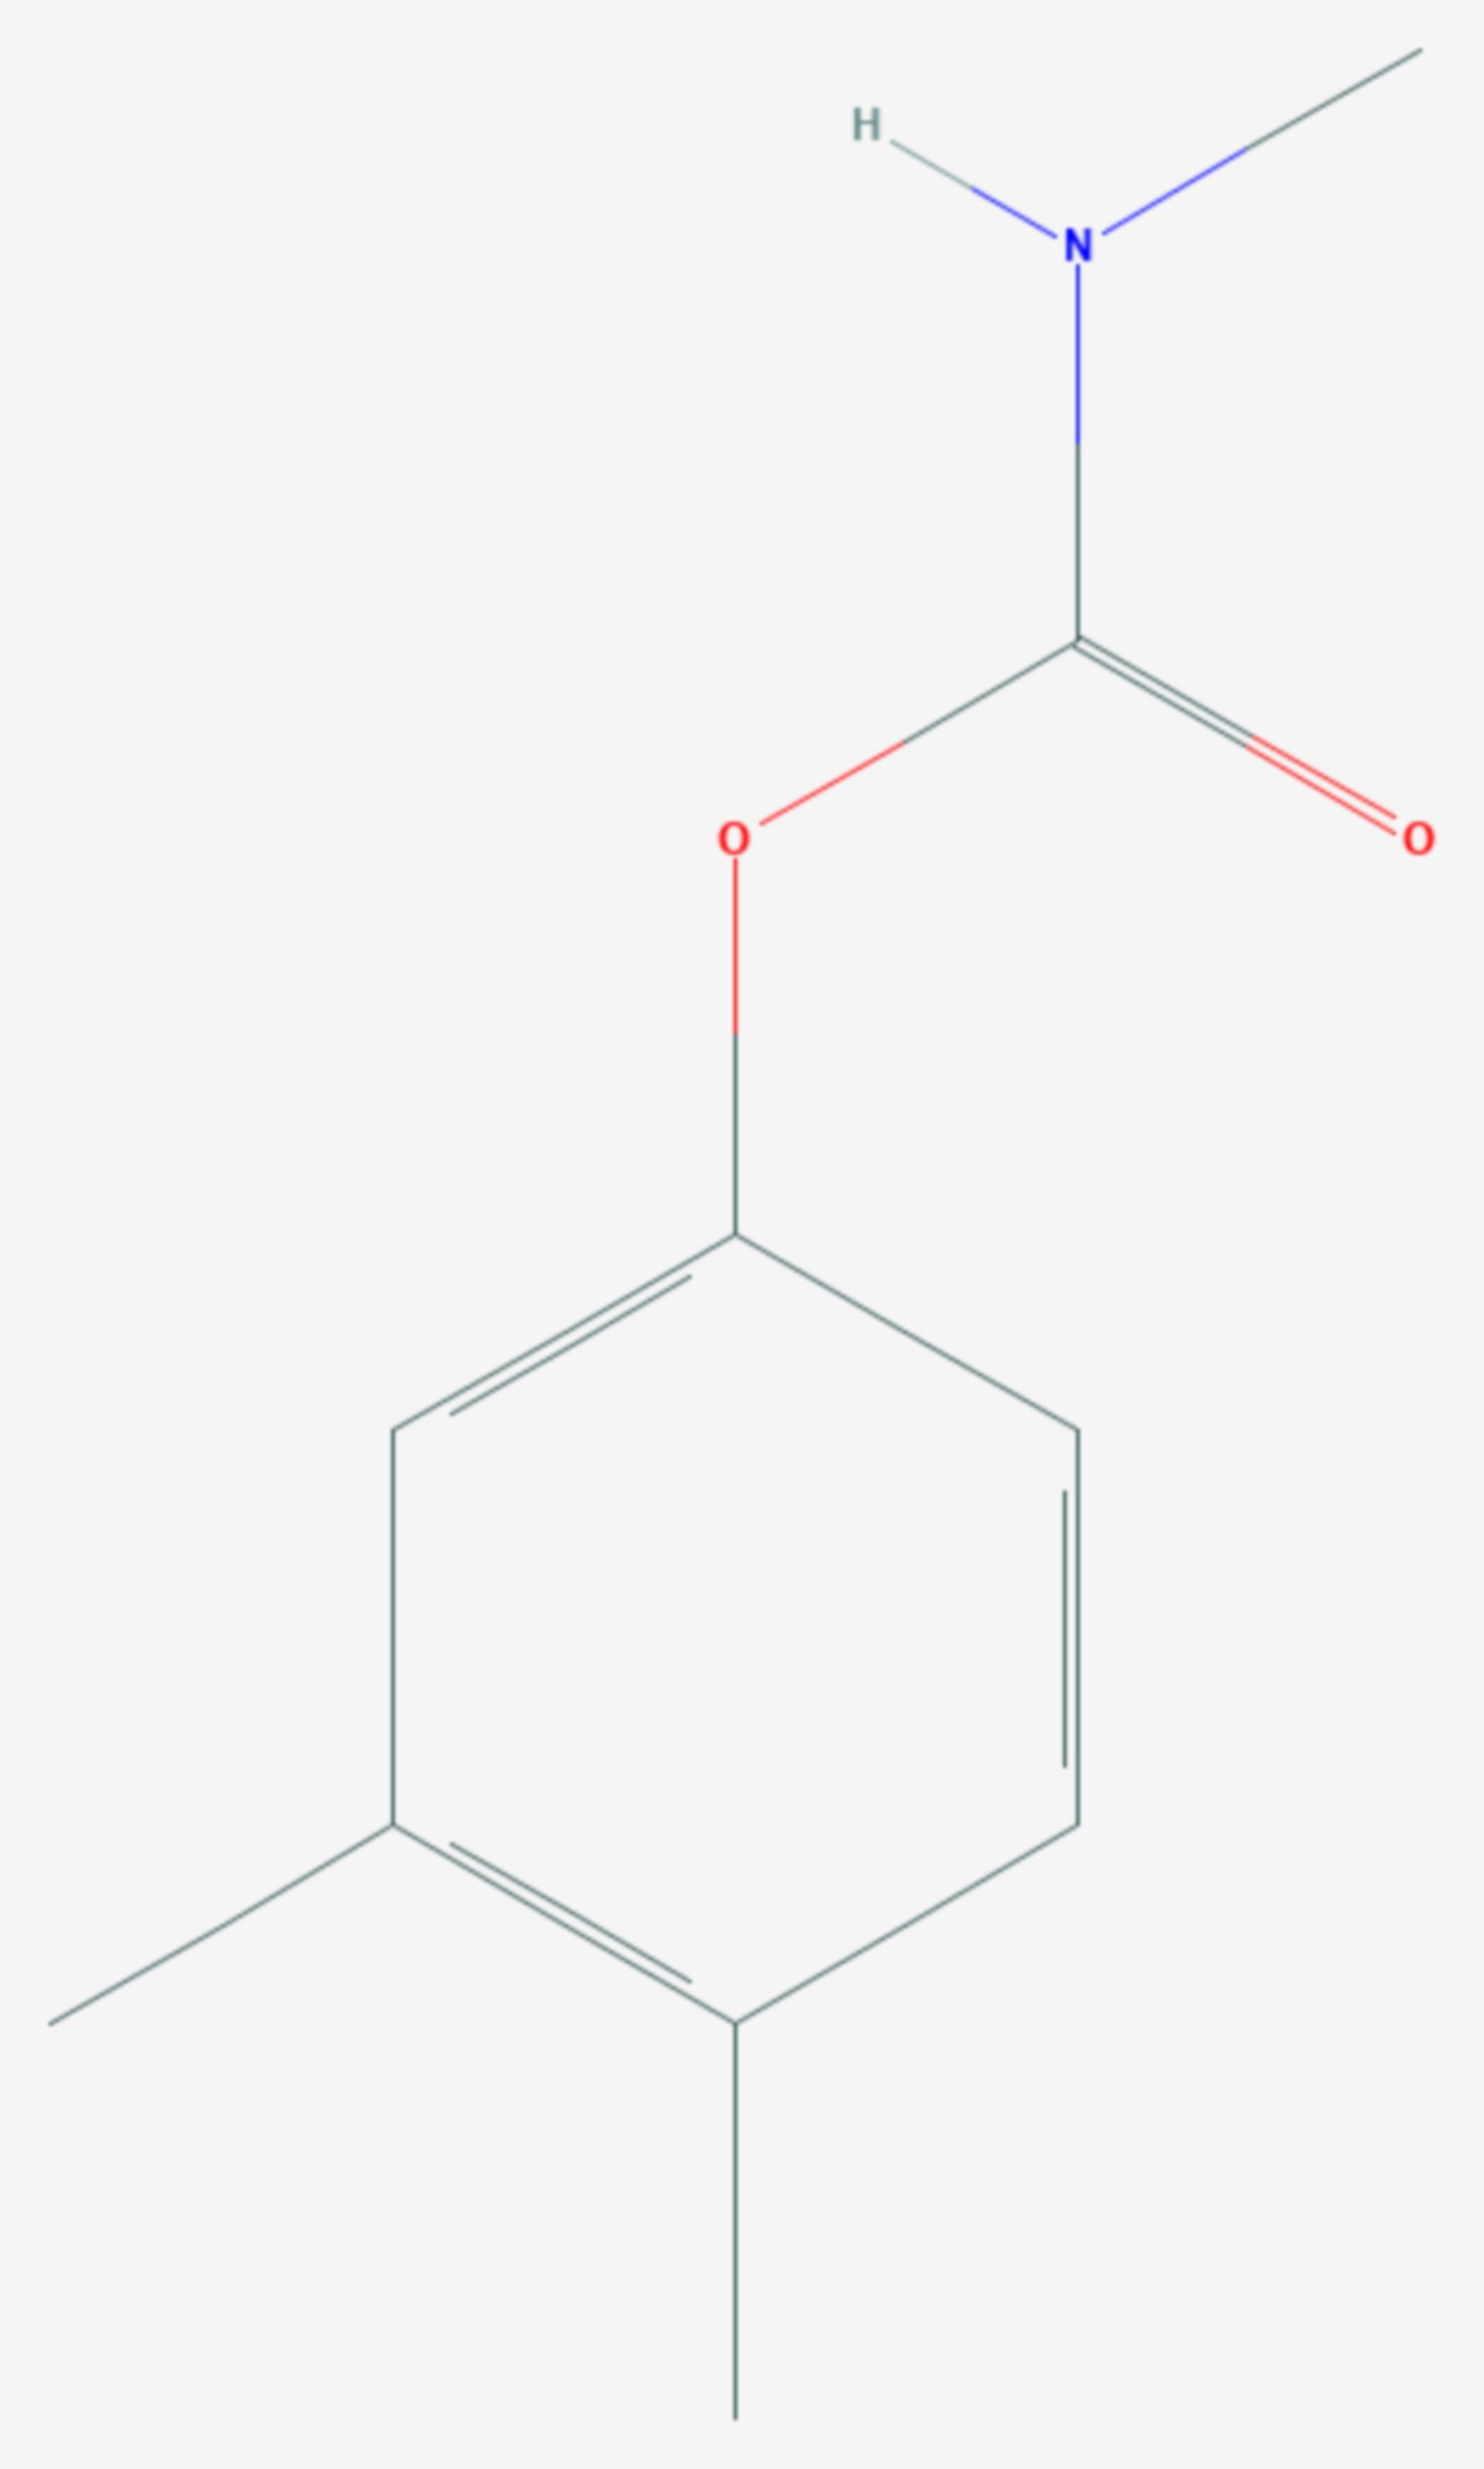 Xylylcarb (Strukturformel)